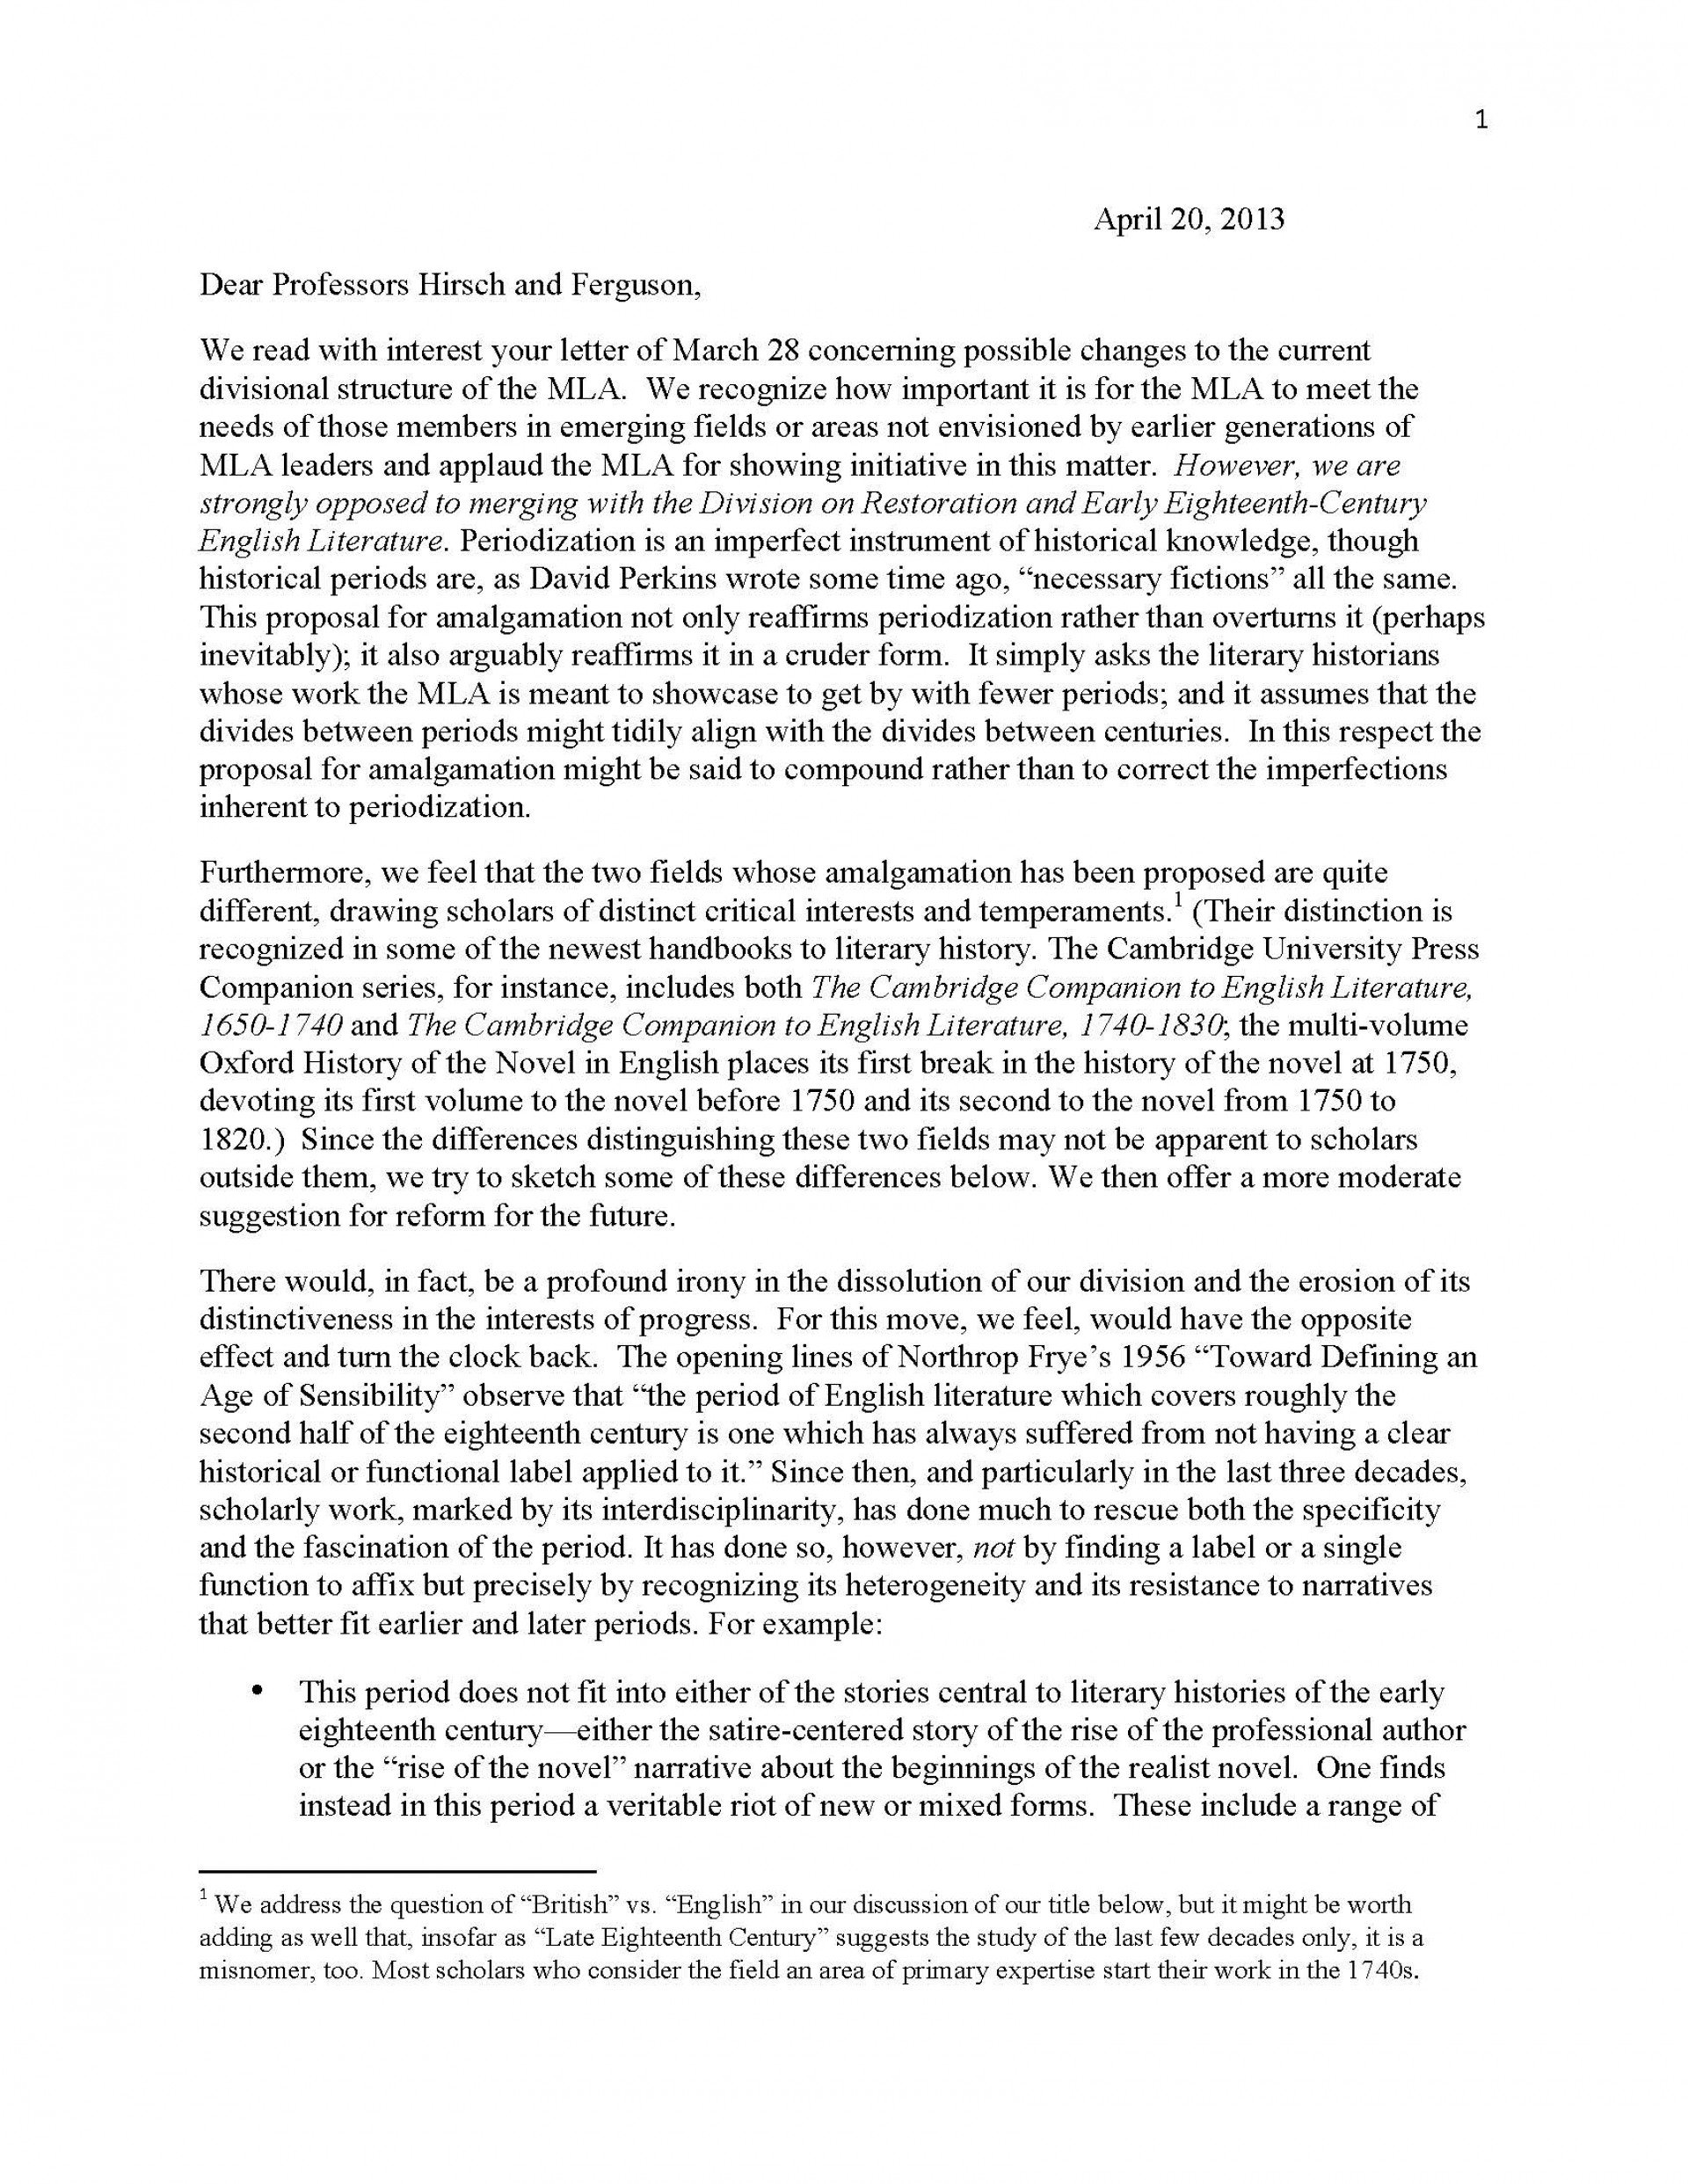 008 Essay Proposal Response To Marianne Hirsch Margaret Ferguson Rev Final Copy Page 1 Top Apa Format Example Samples 1920